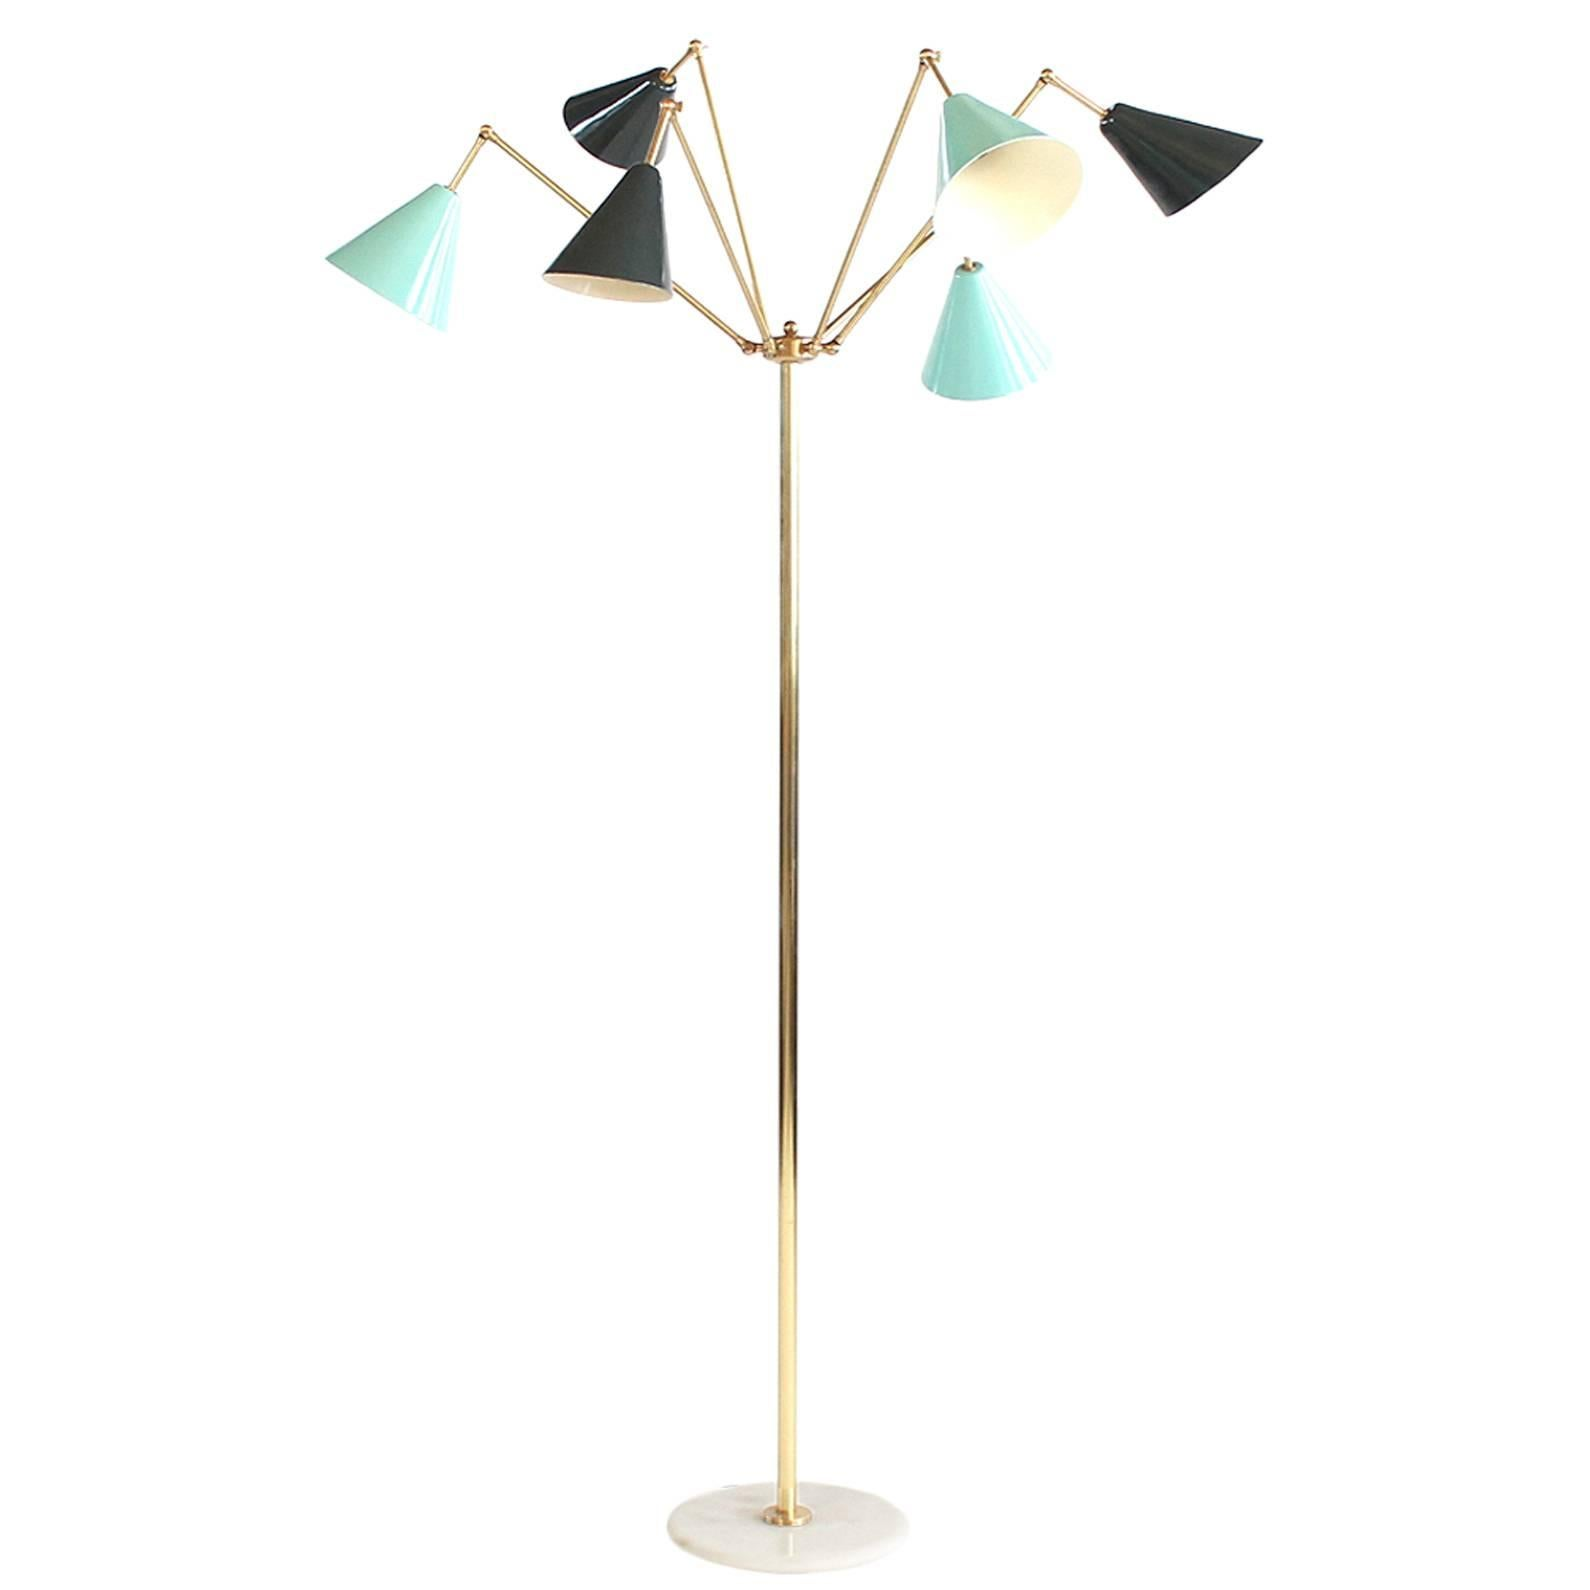 Attributed to Stilnovo 1960s Italian Floor Lamp